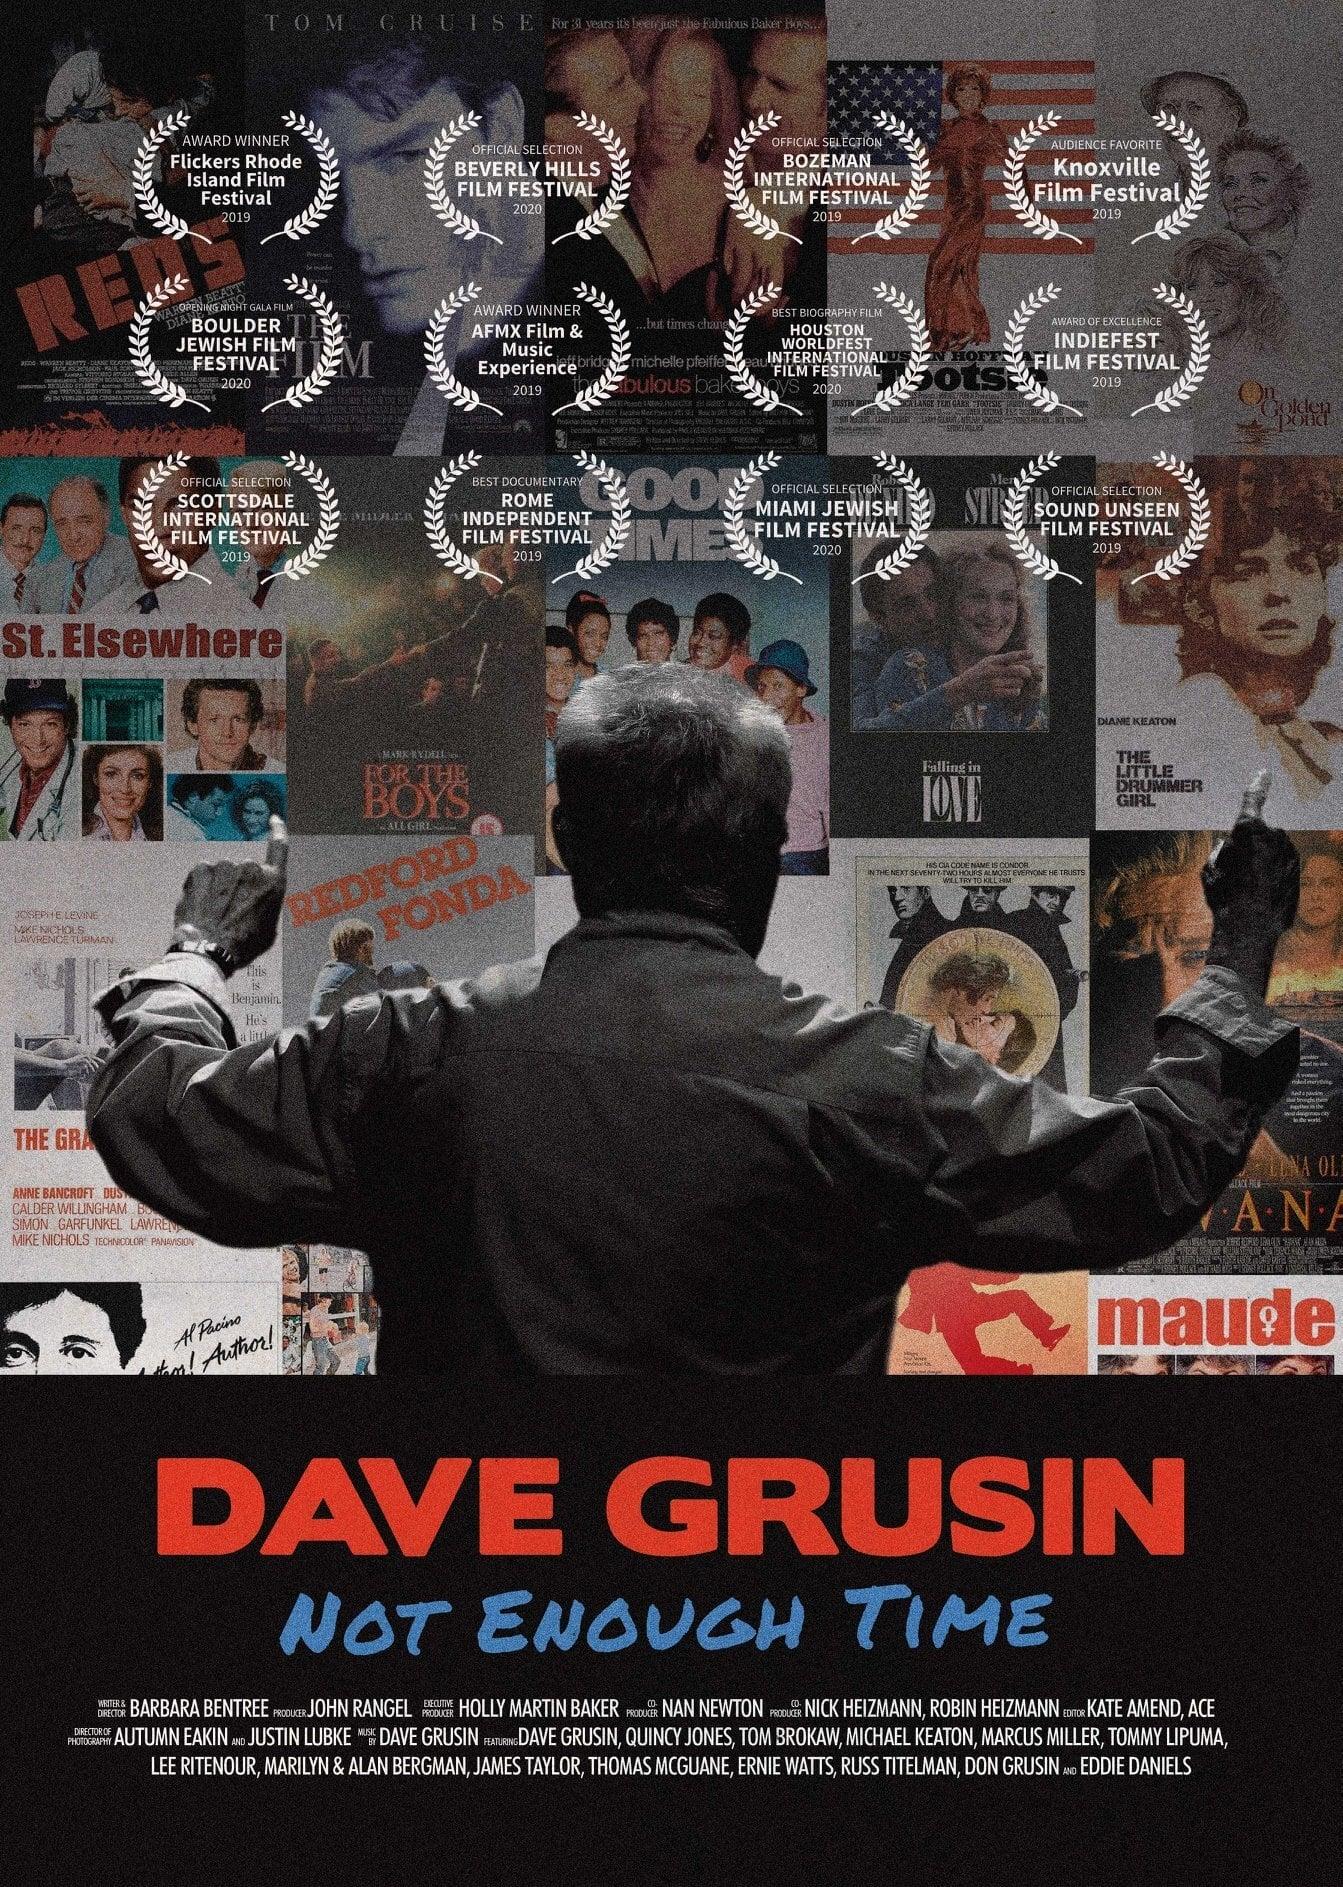 Dave Grusin: Not Enough Time